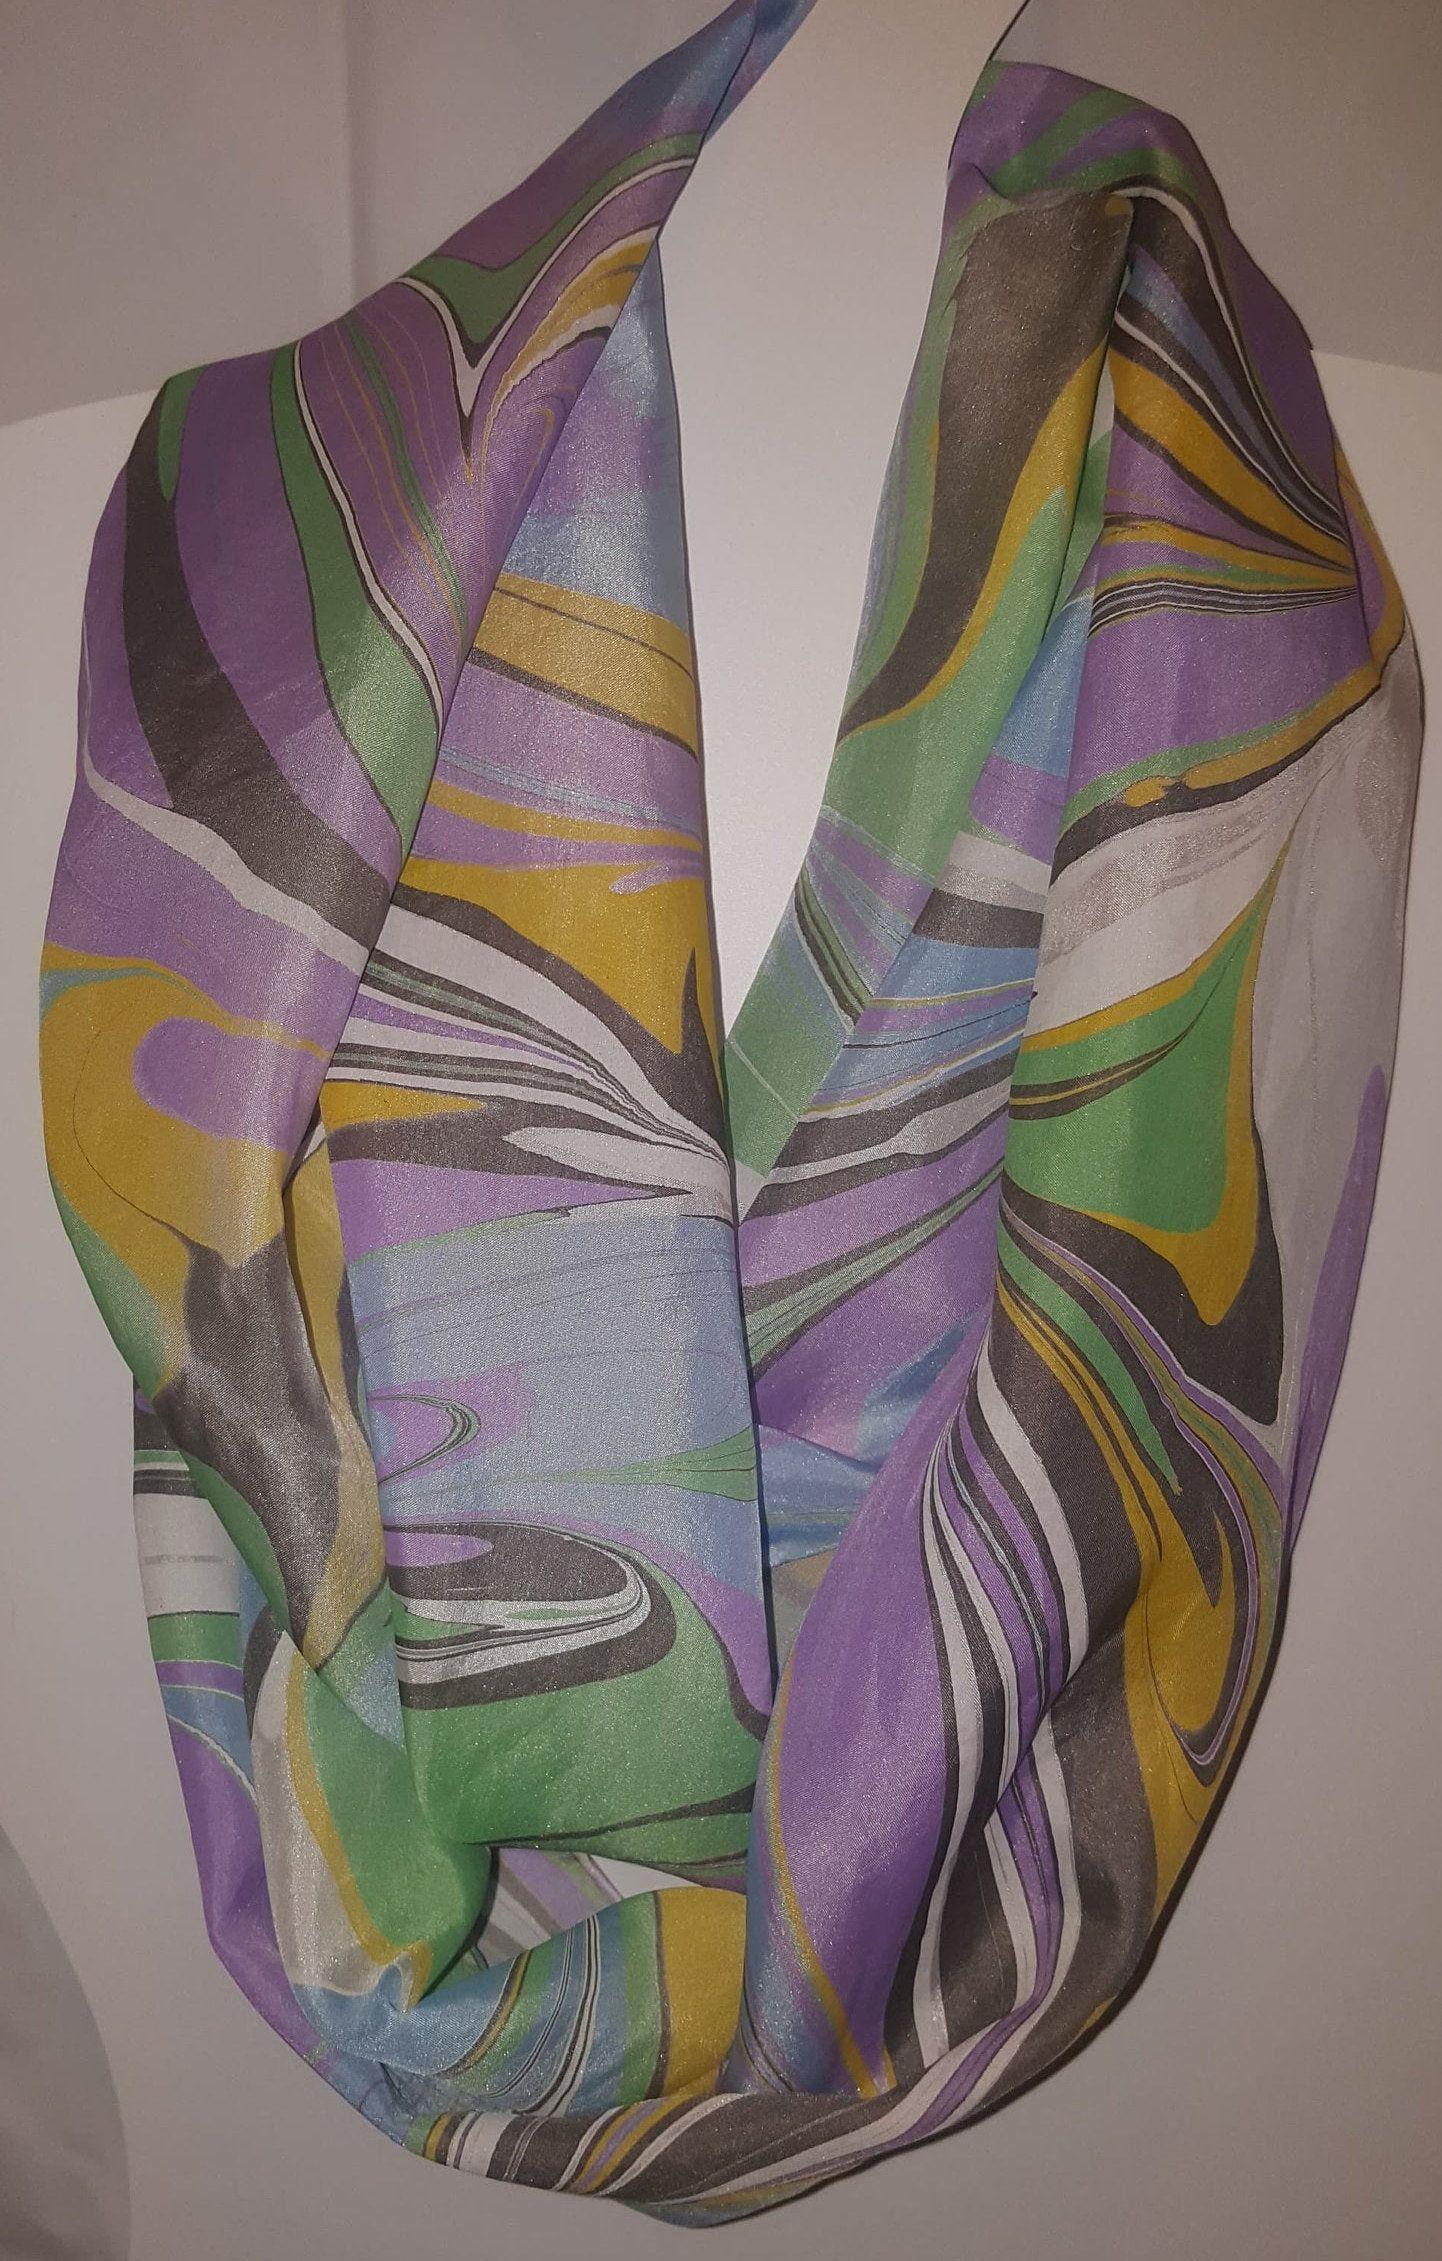 100 Silk Scarf Water Marbled Hand Painted Ebru With Etsy In 2020 Silk Set Habotai Silk Silk Scraf